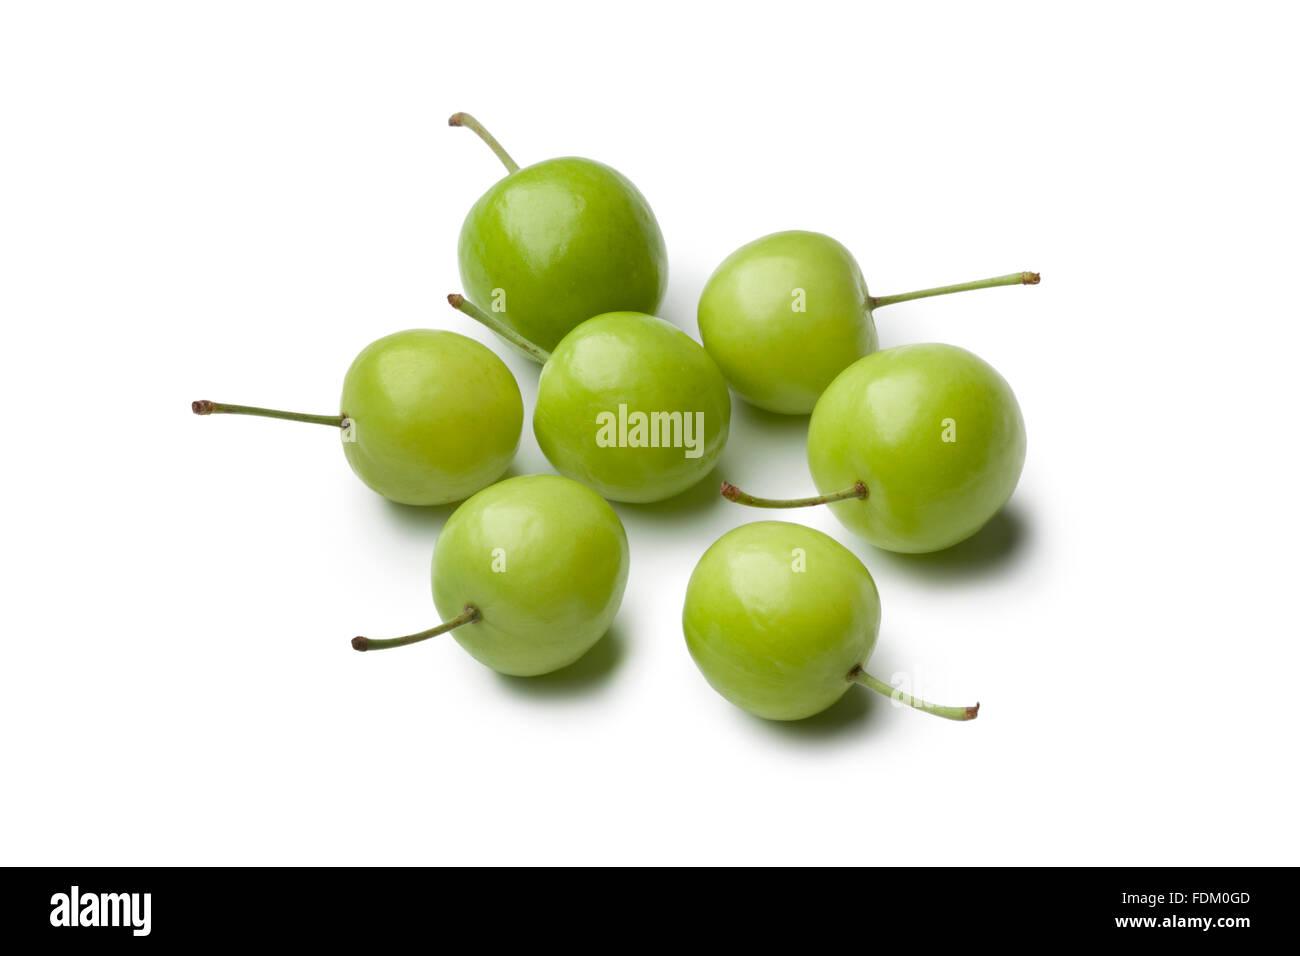 Fresh whole Can Erik plums on white background - Stock Image